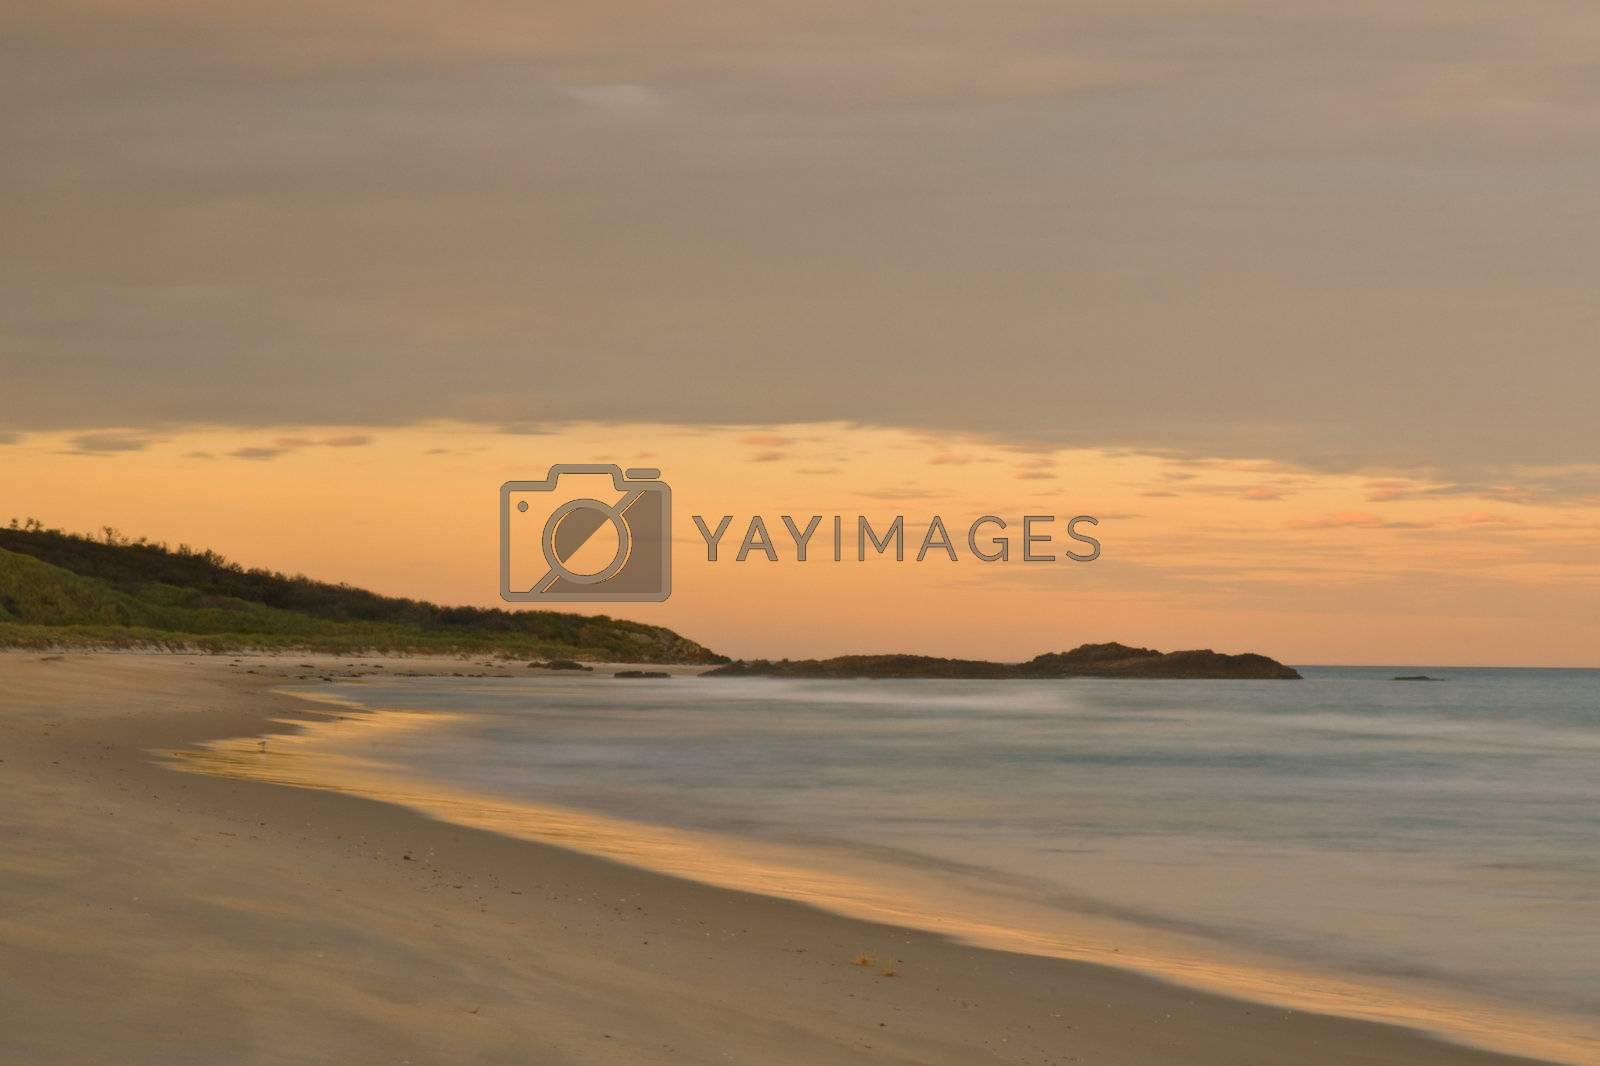 Golden light after a sunset at a beach, with long exposure